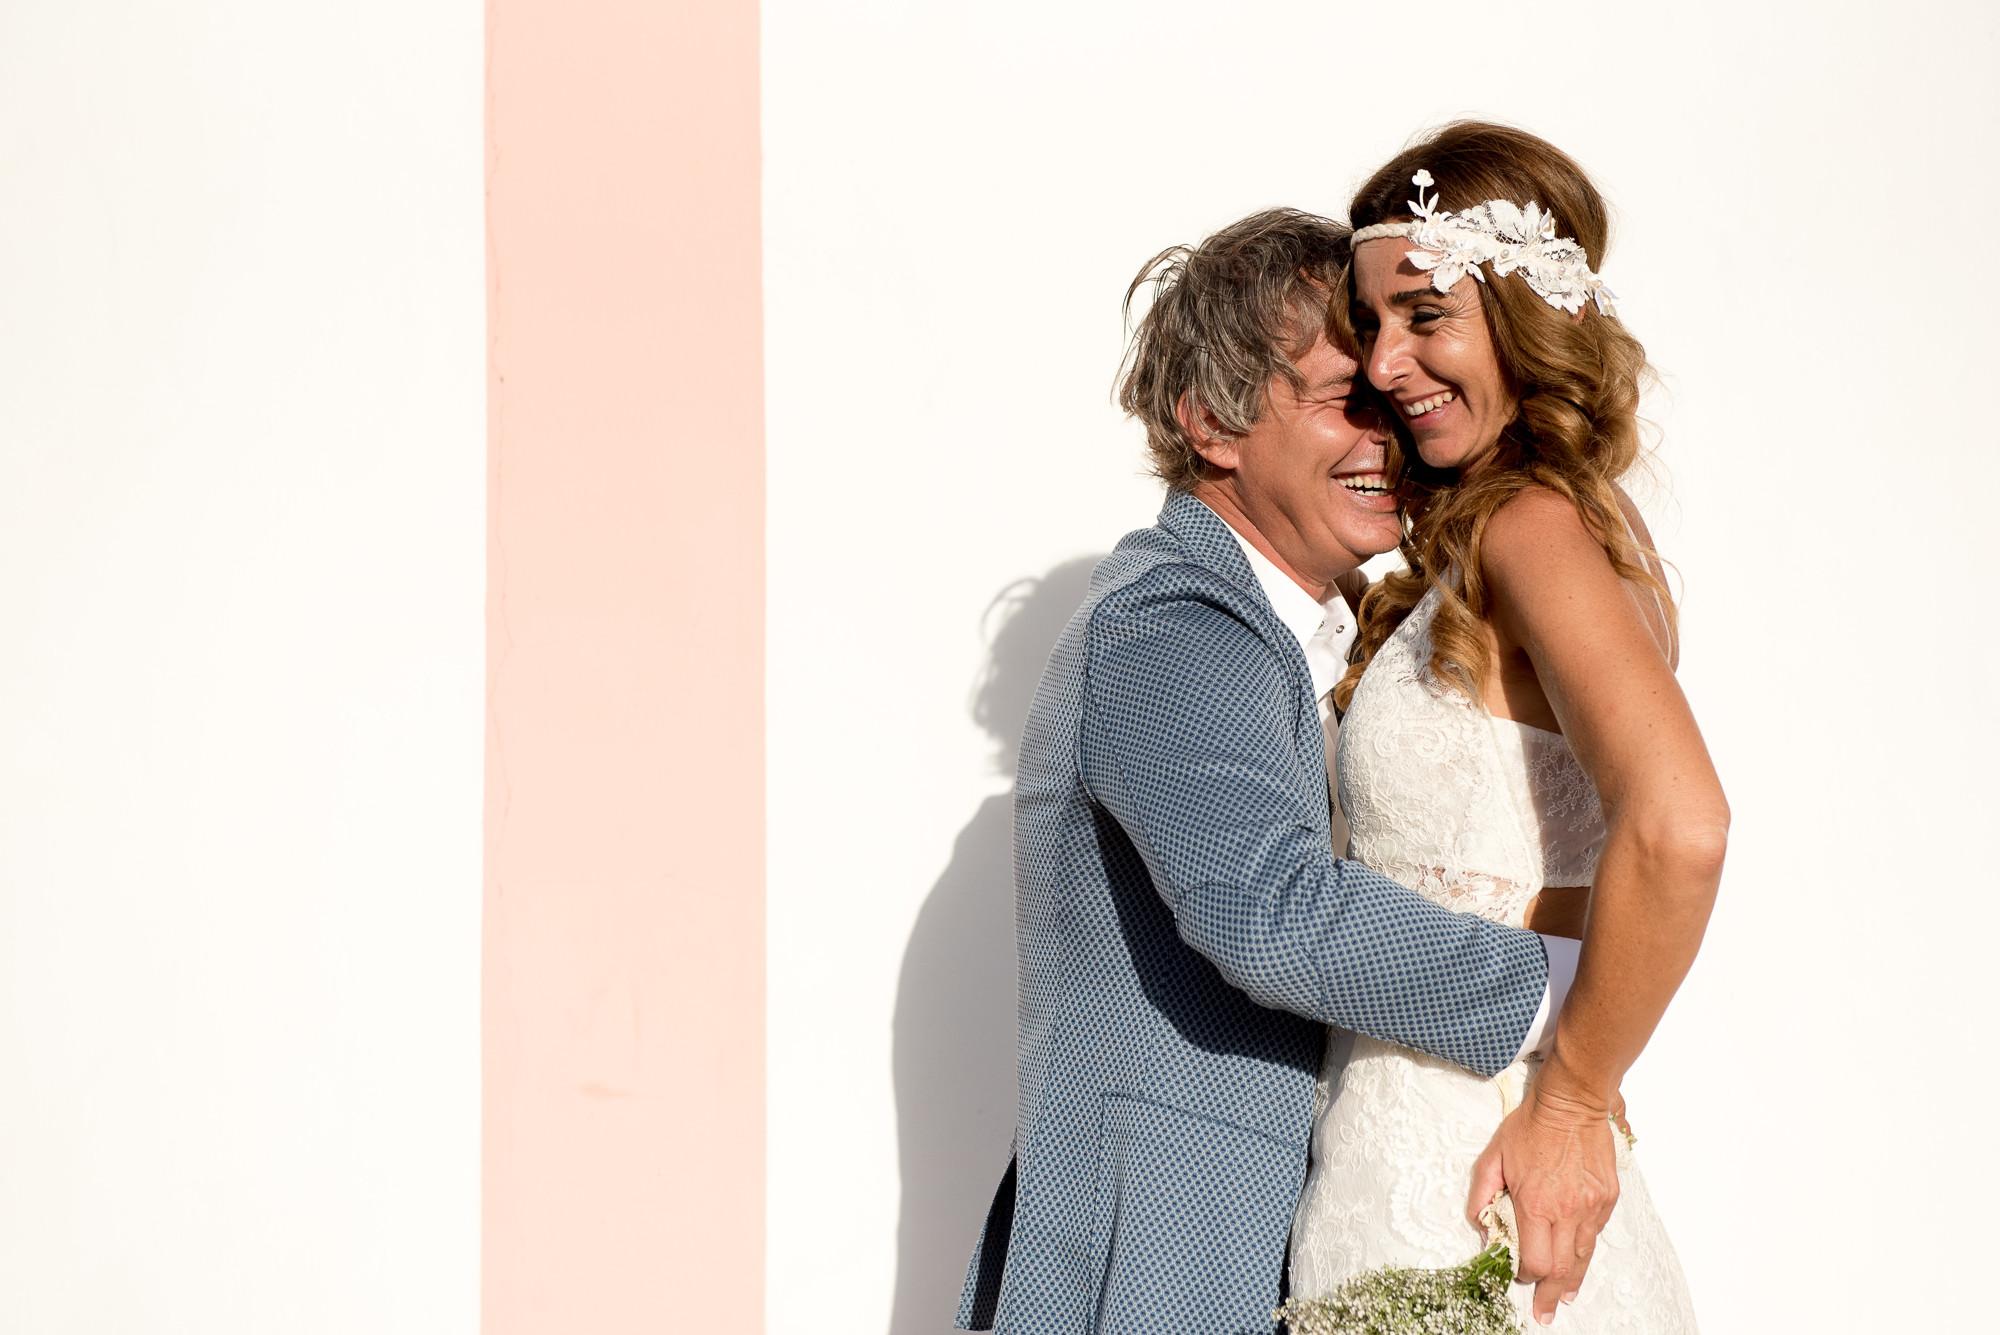 boda lanzarote fotografo de bodas lanzarote 41